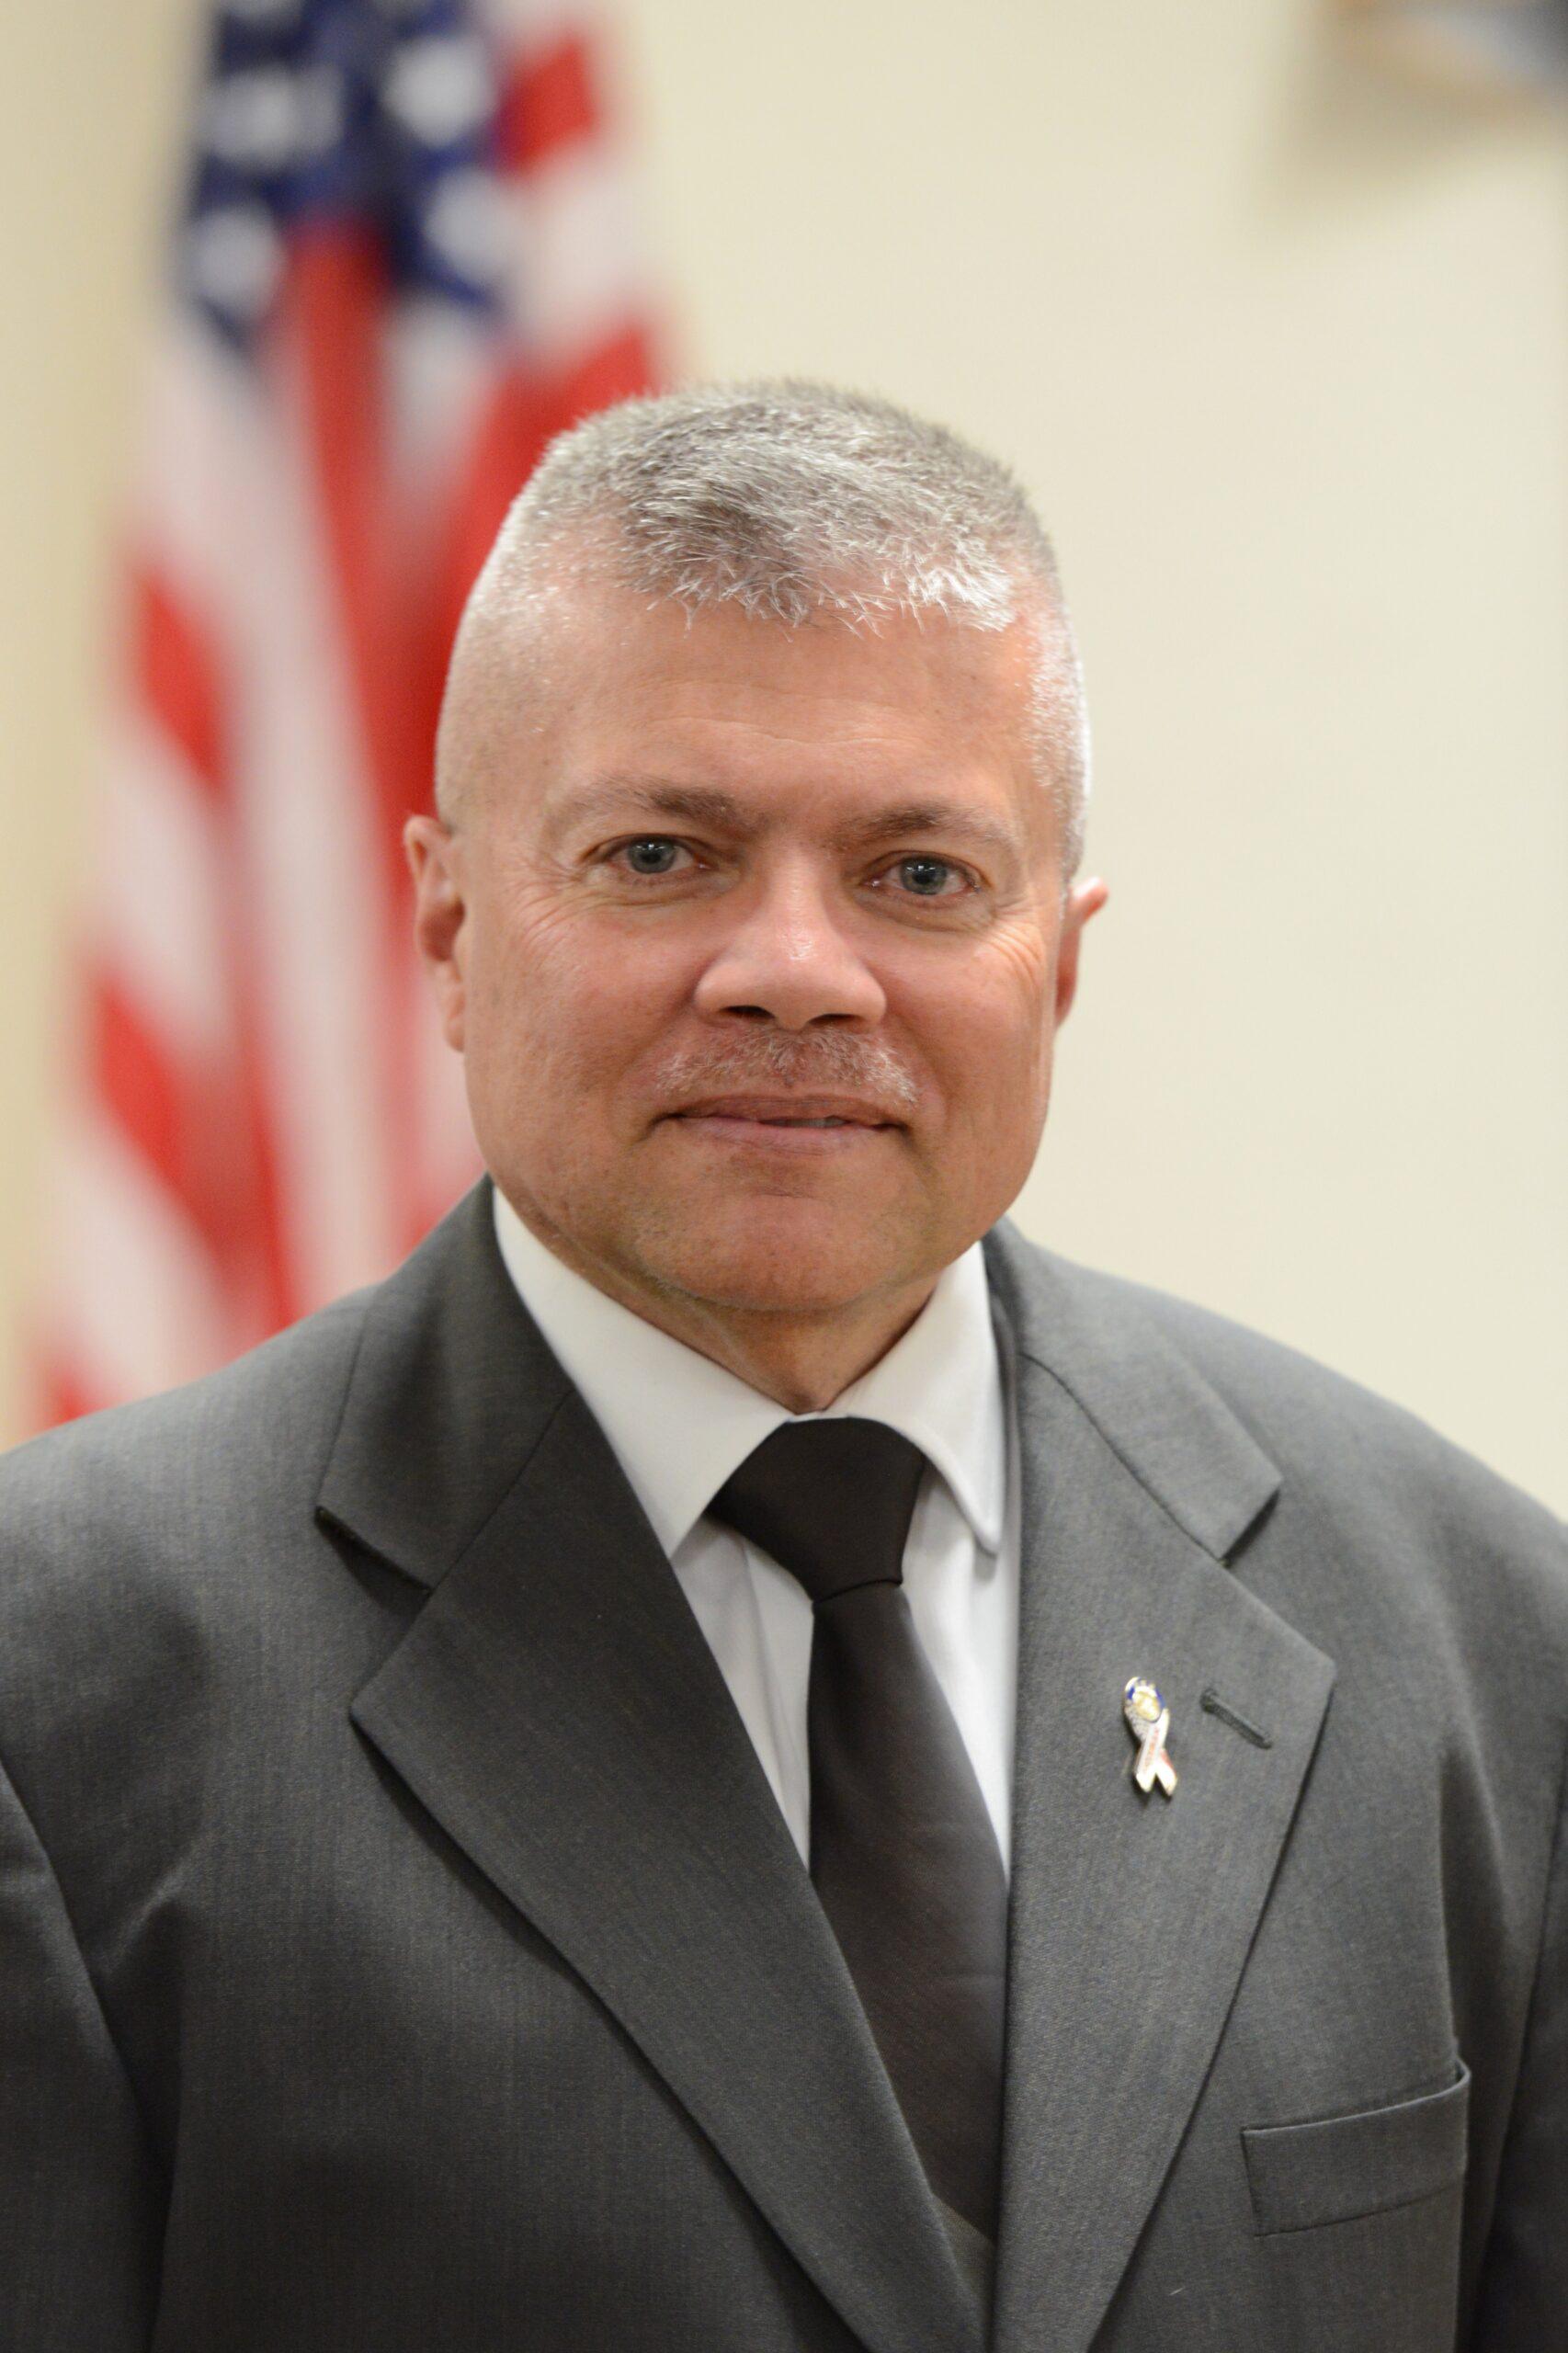 Mayor John Ramos